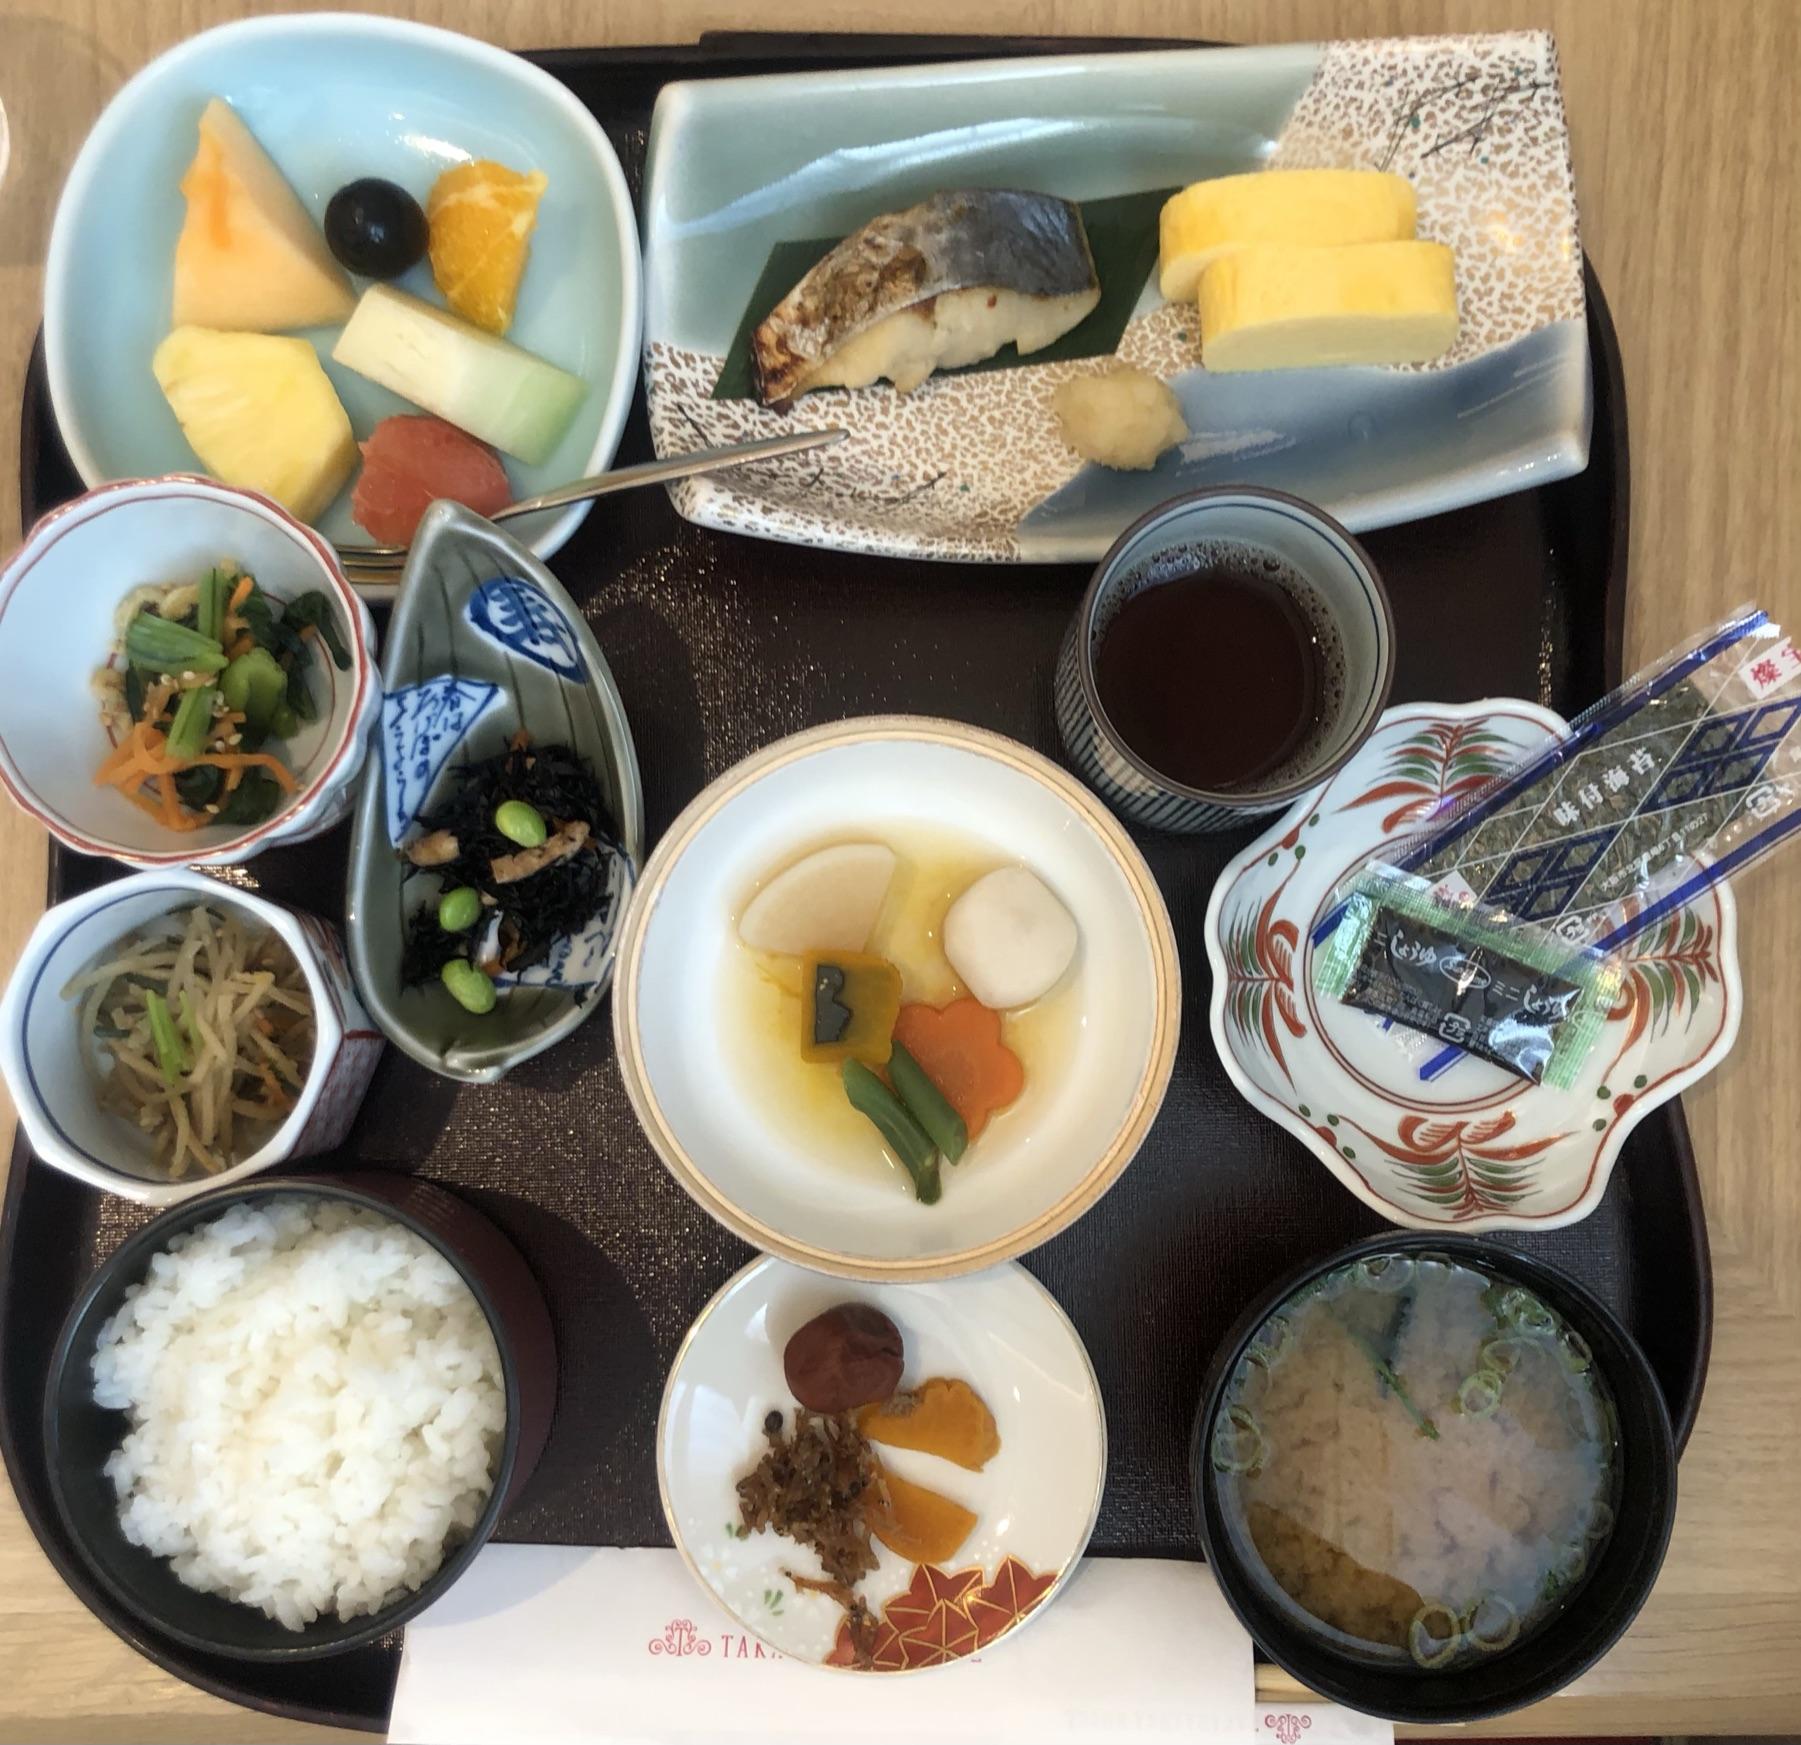 宝塚ホテル 和食 懐石料理 夕食